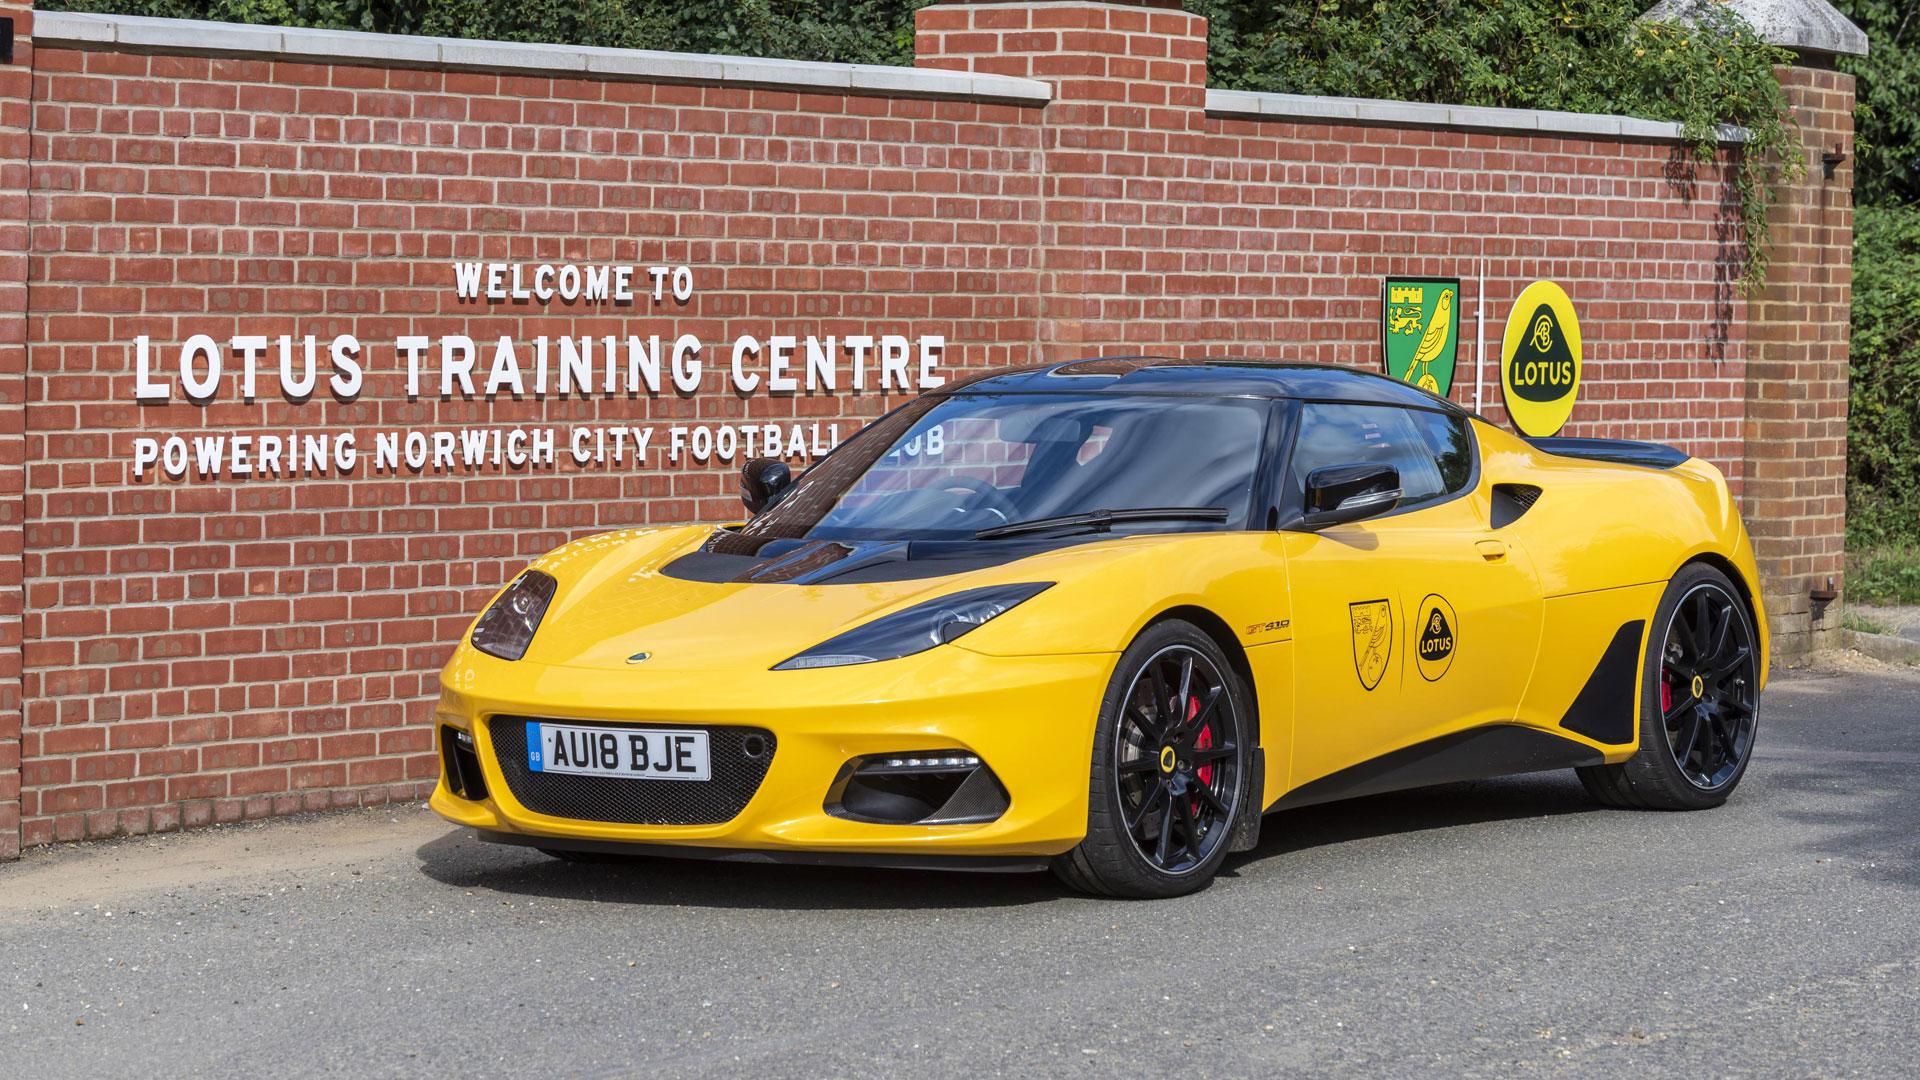 Lotus Training Centre Norwich City